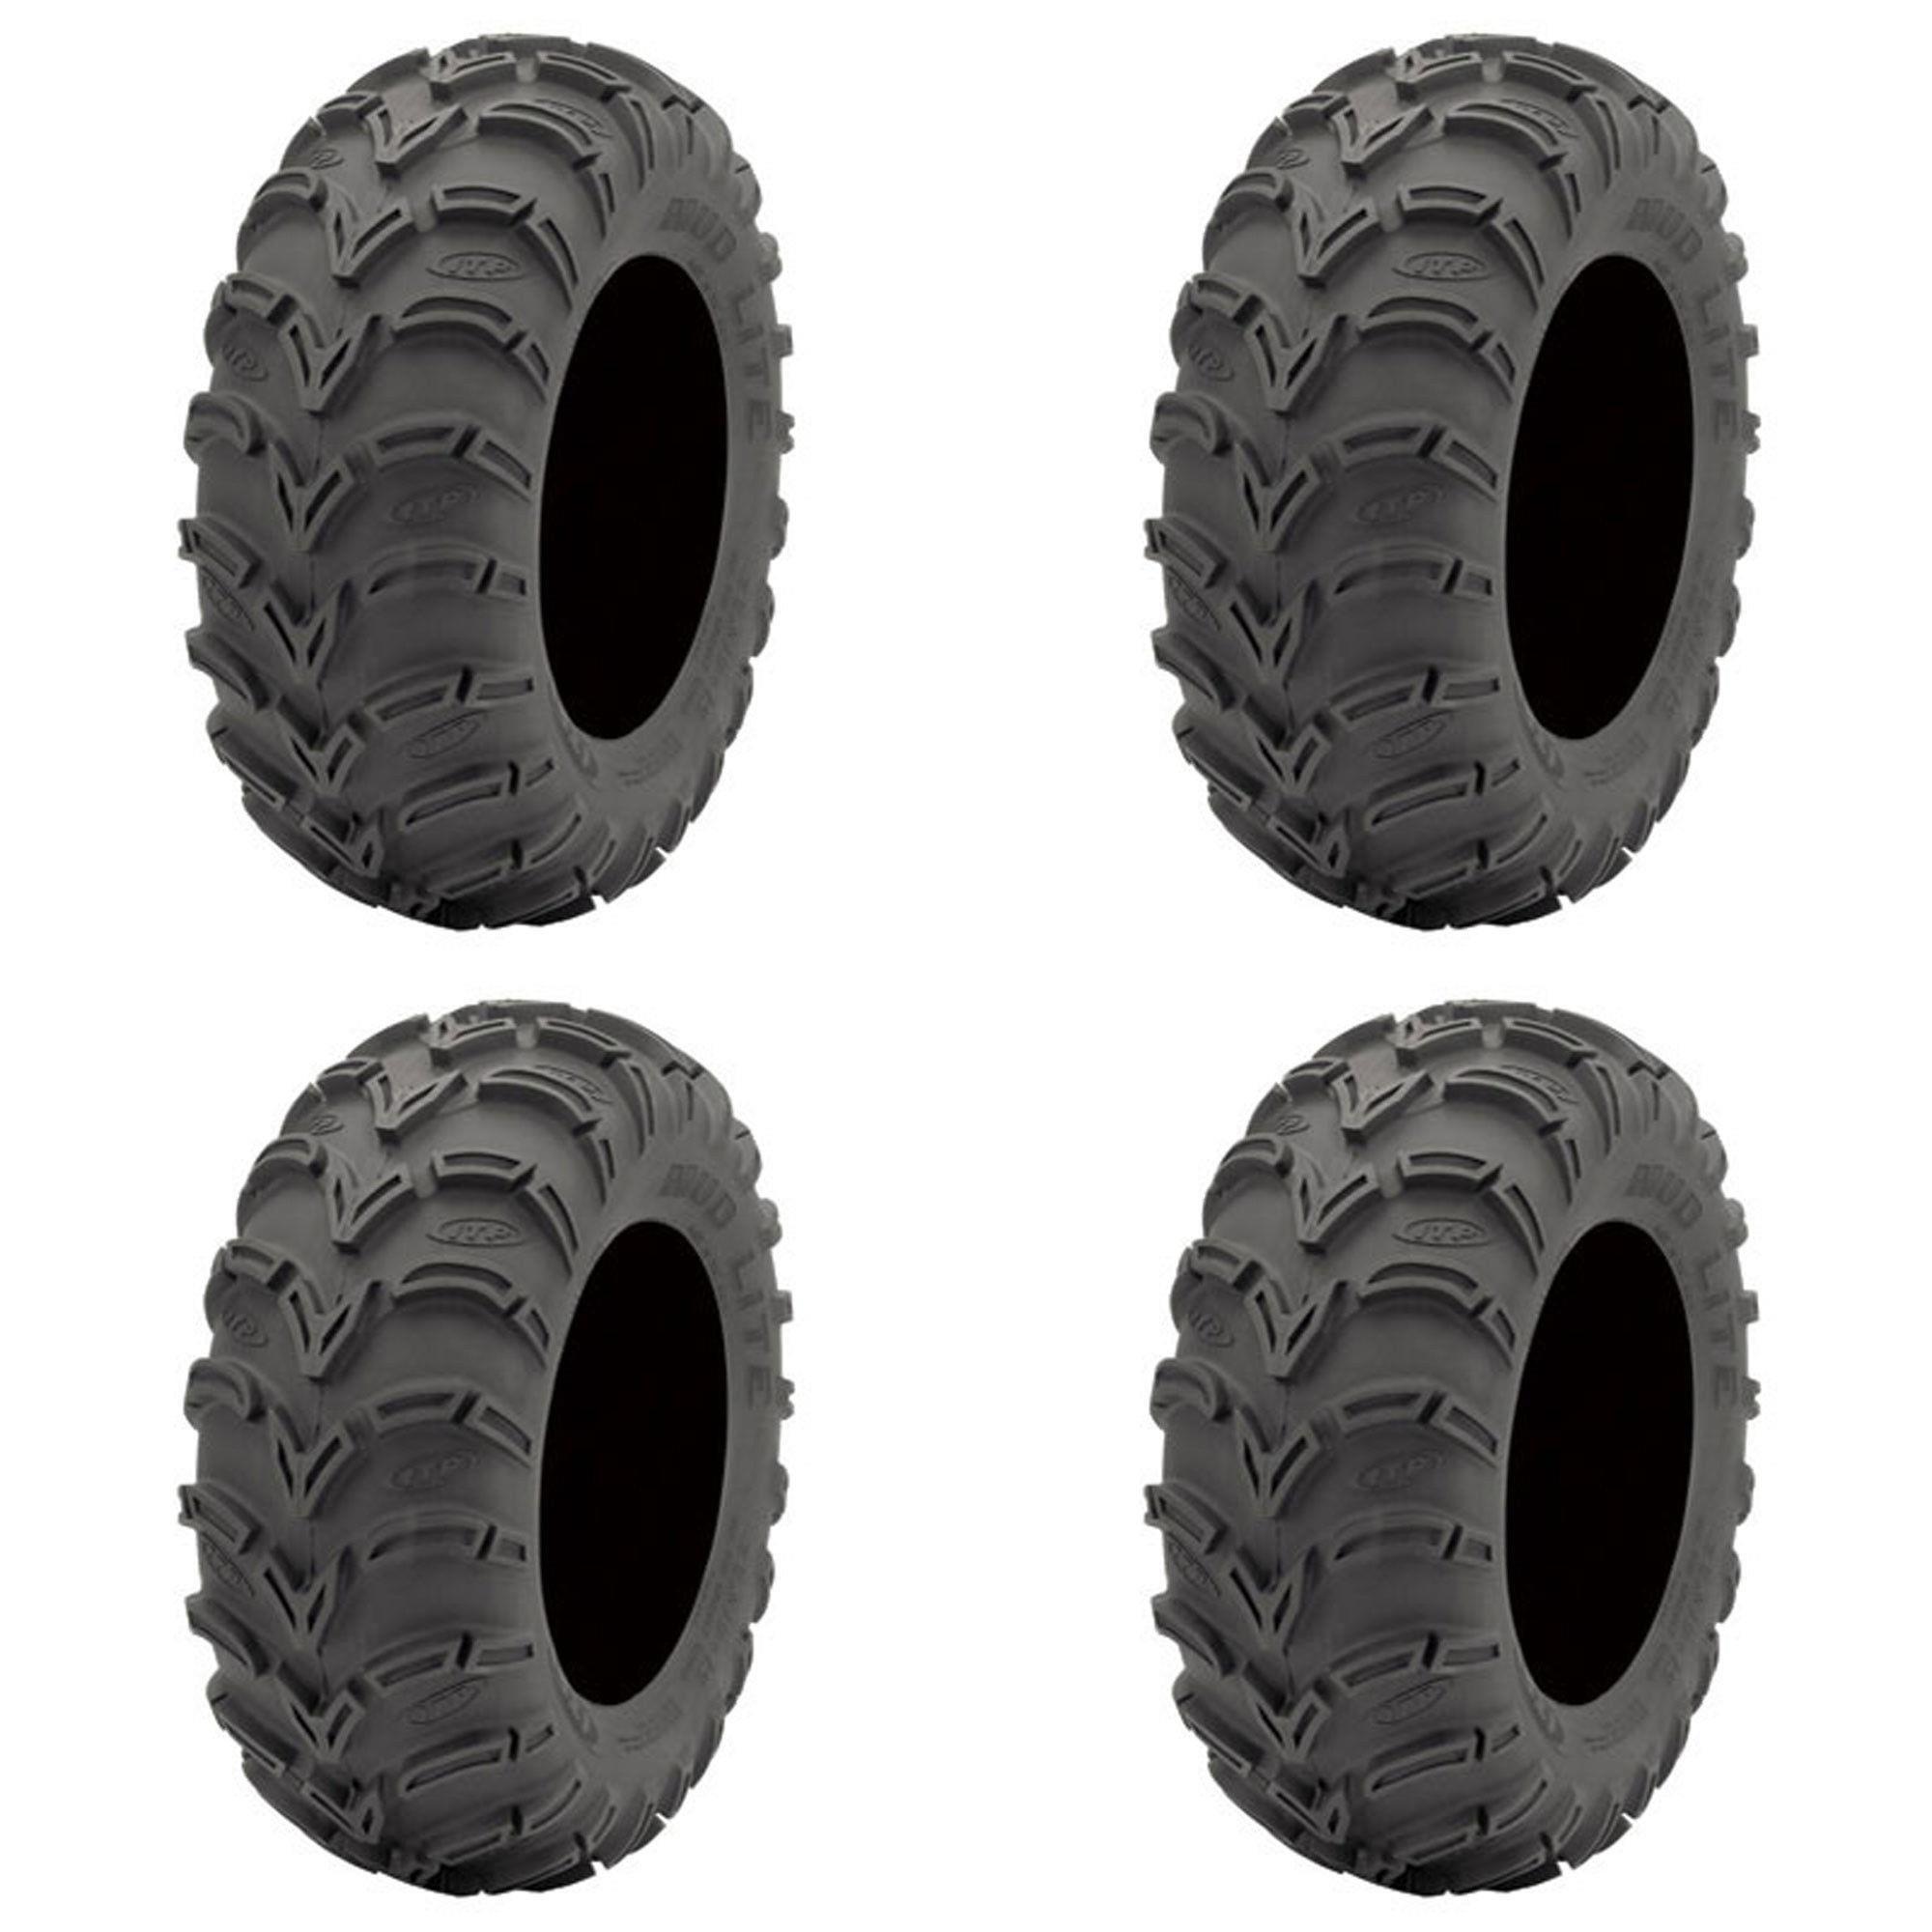 Set of 4 ATV ITP Tires (Mud Lite AT 24x9-11 Front/Rear)